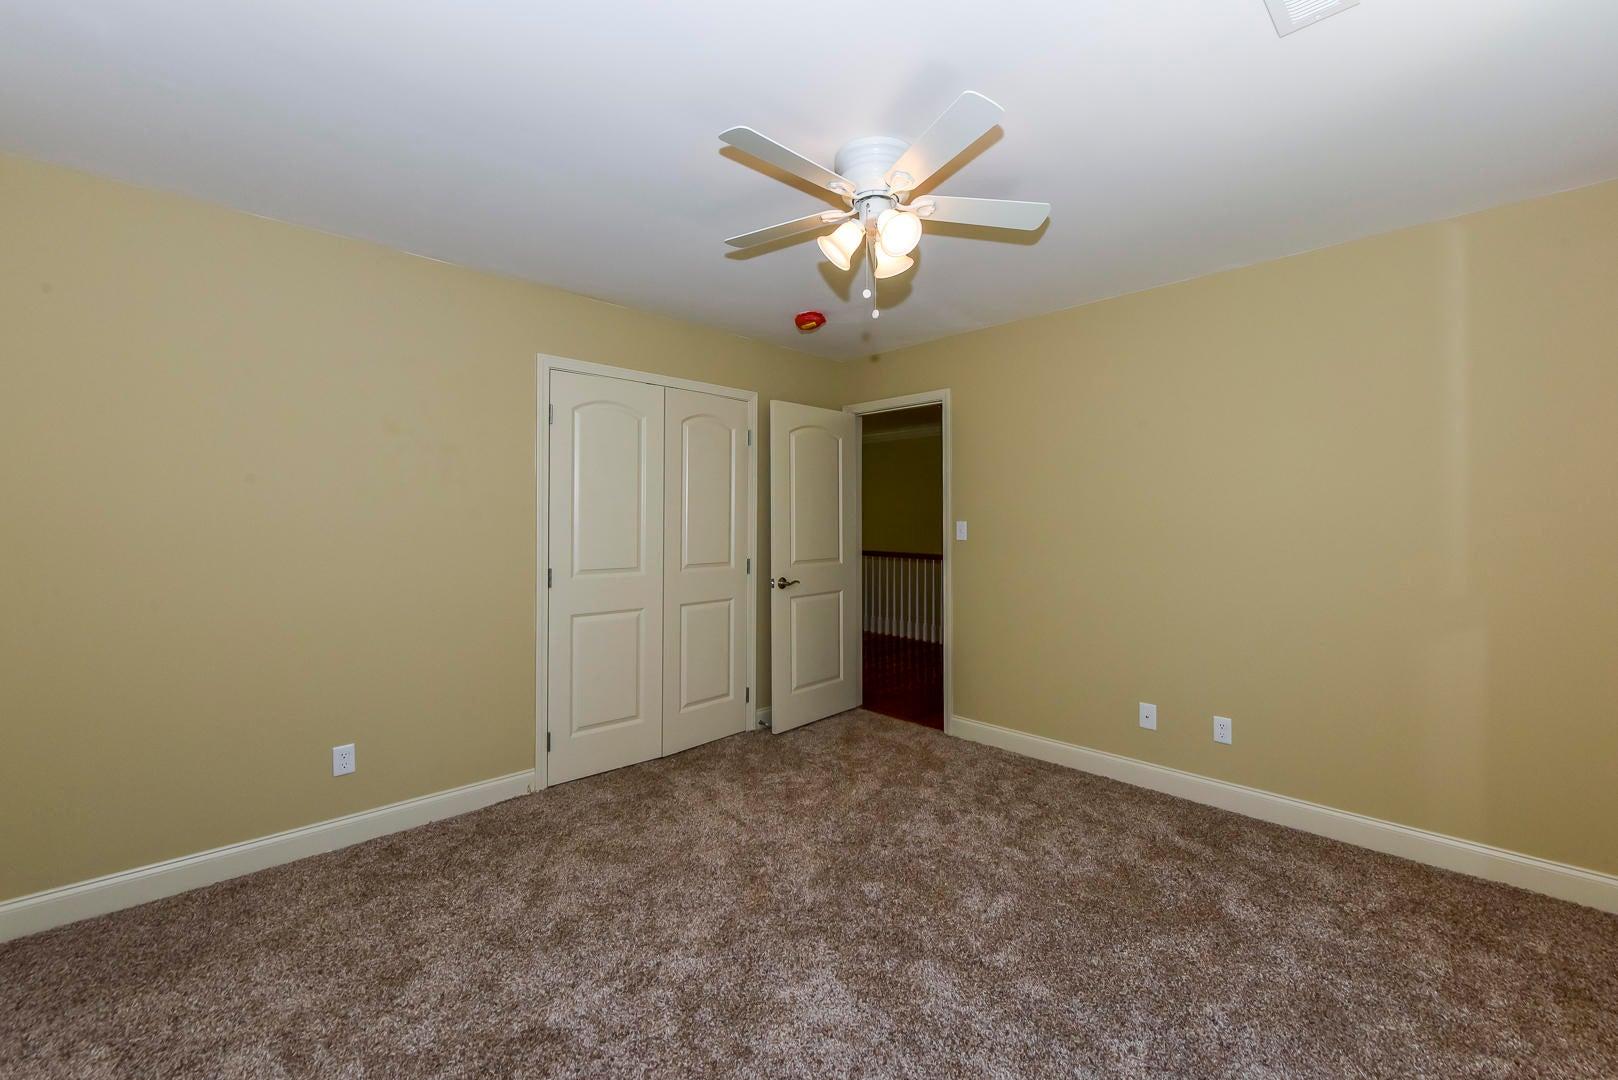 OFFICE/BEDROOM MAIN LEVEL